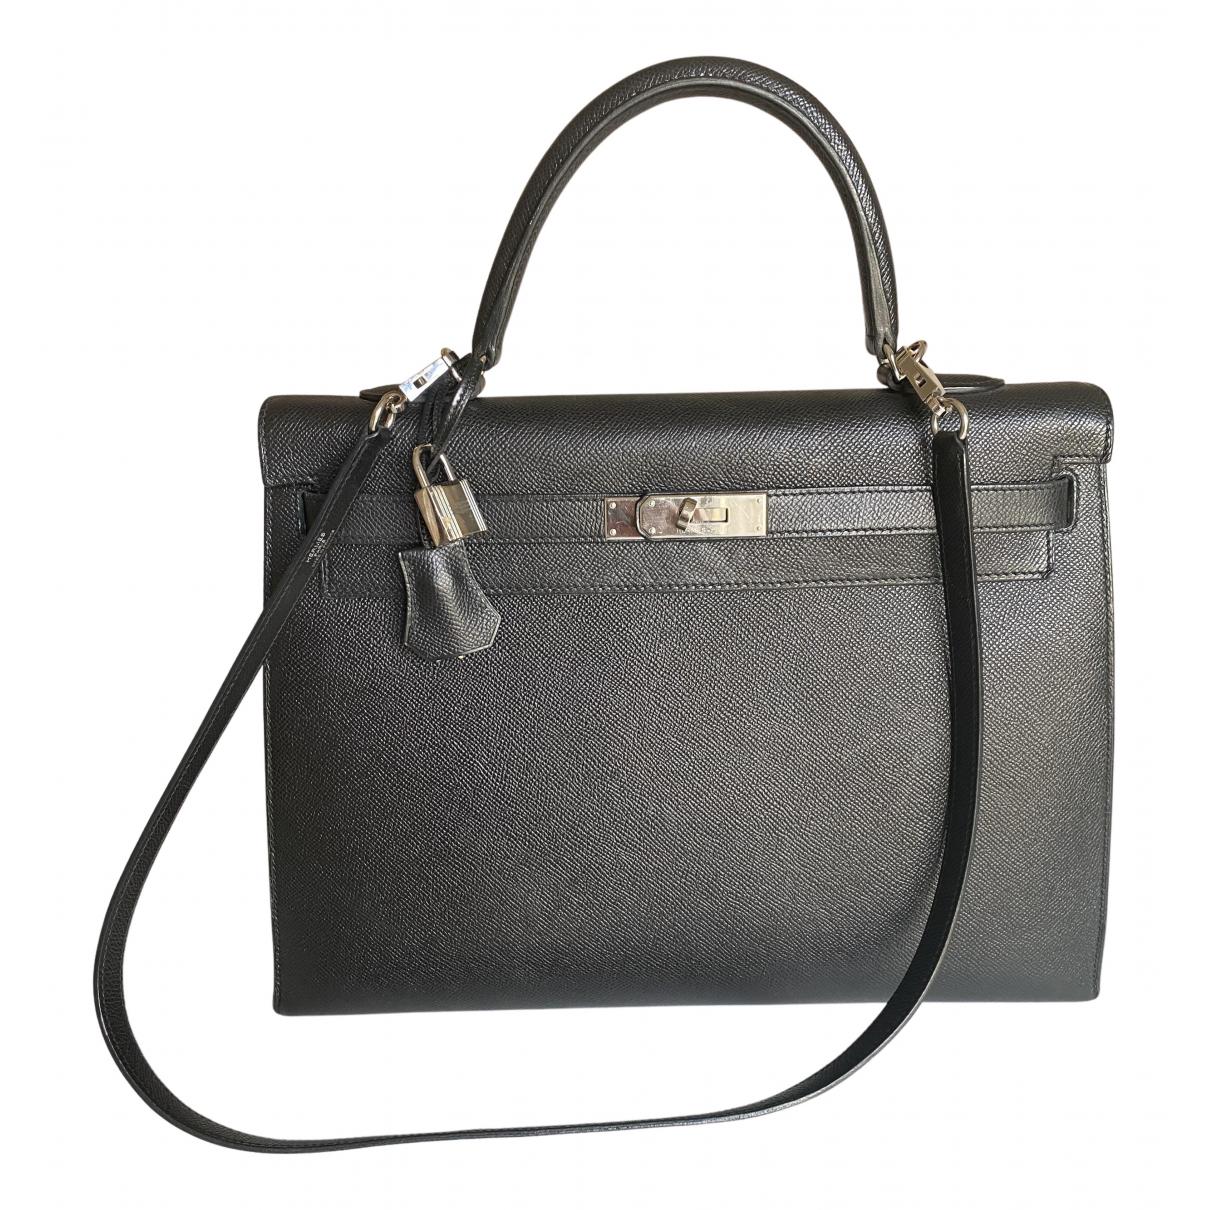 Hermes Kelly 35 Handtasche in  Schwarz Leder